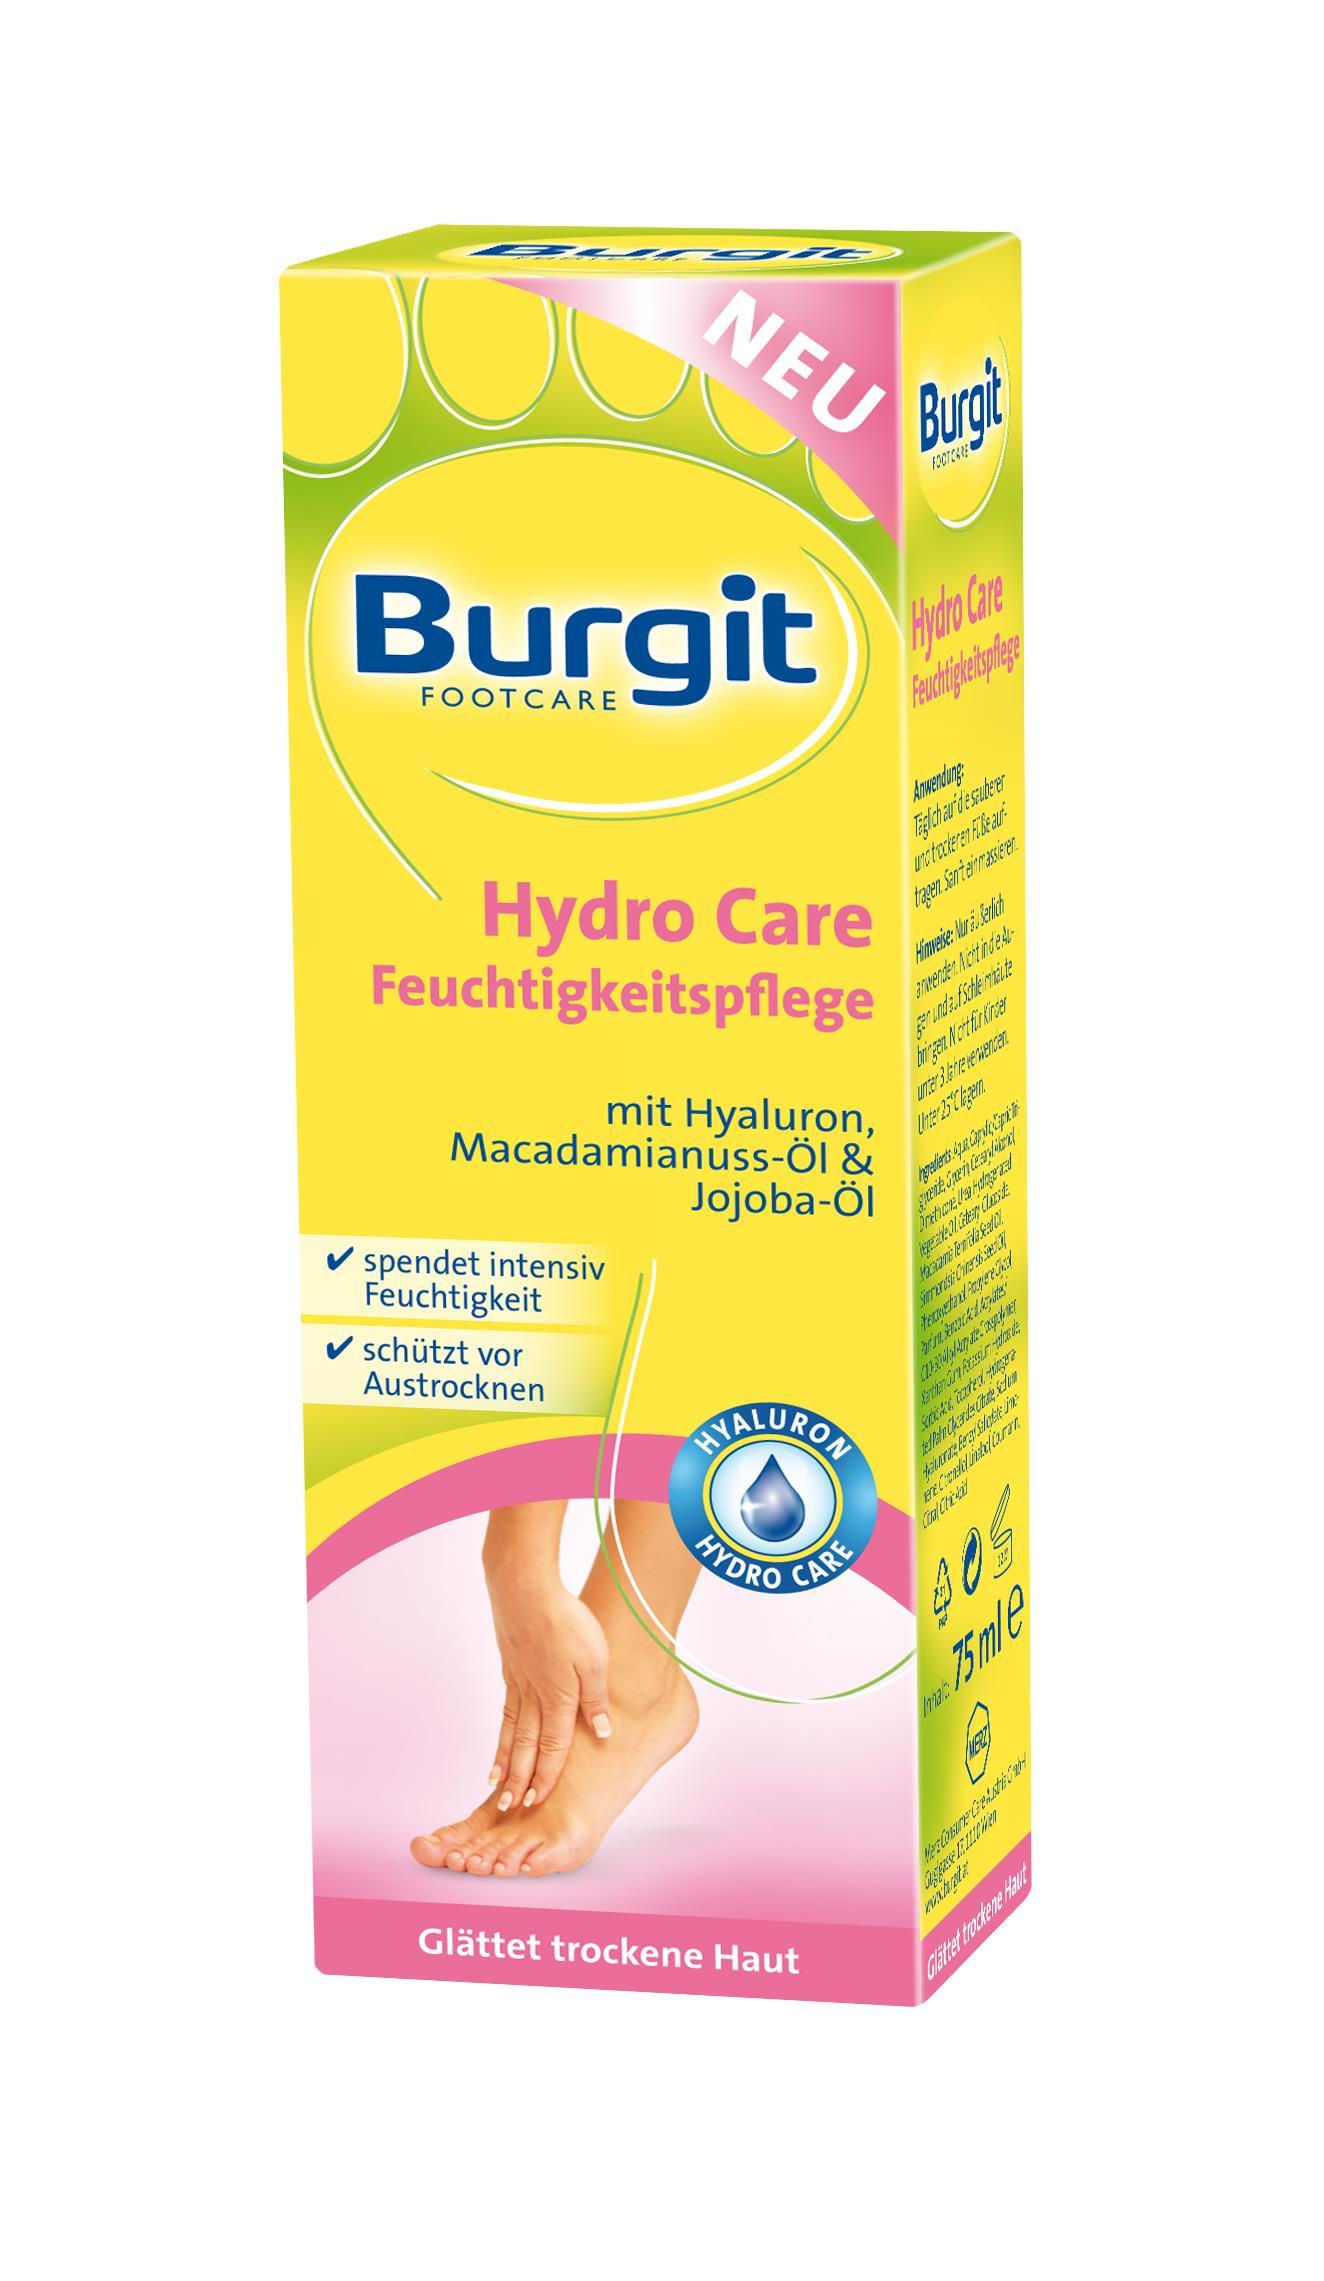 Hydro Care Feuchtigkeitspflege